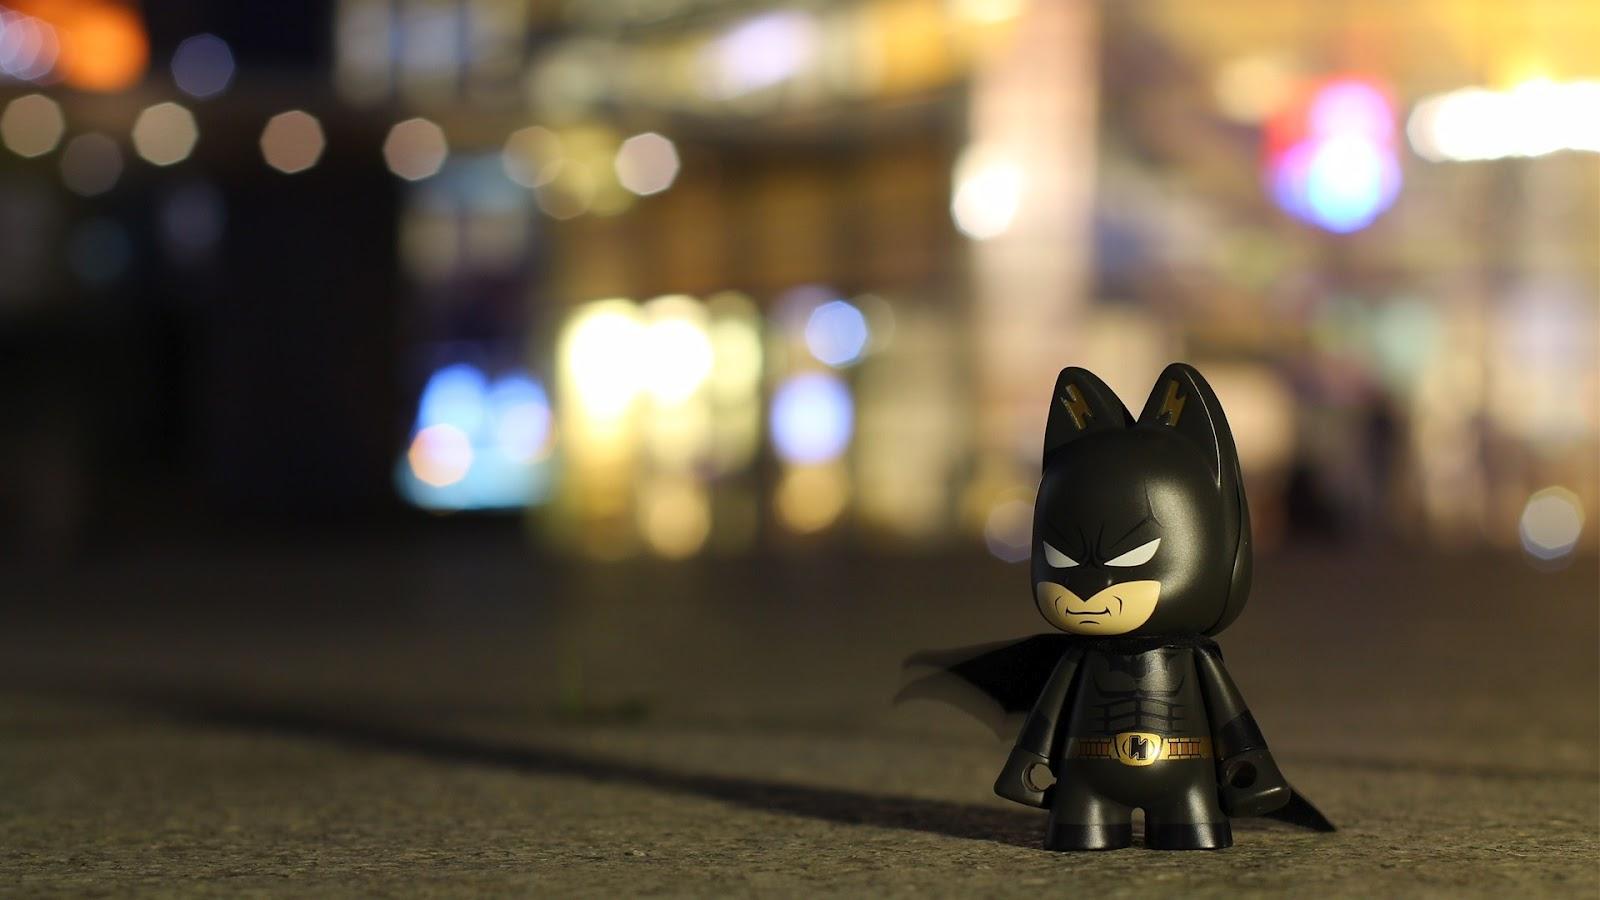 Batman Lego Bulb Effect - Batman Lego Bulb Effect